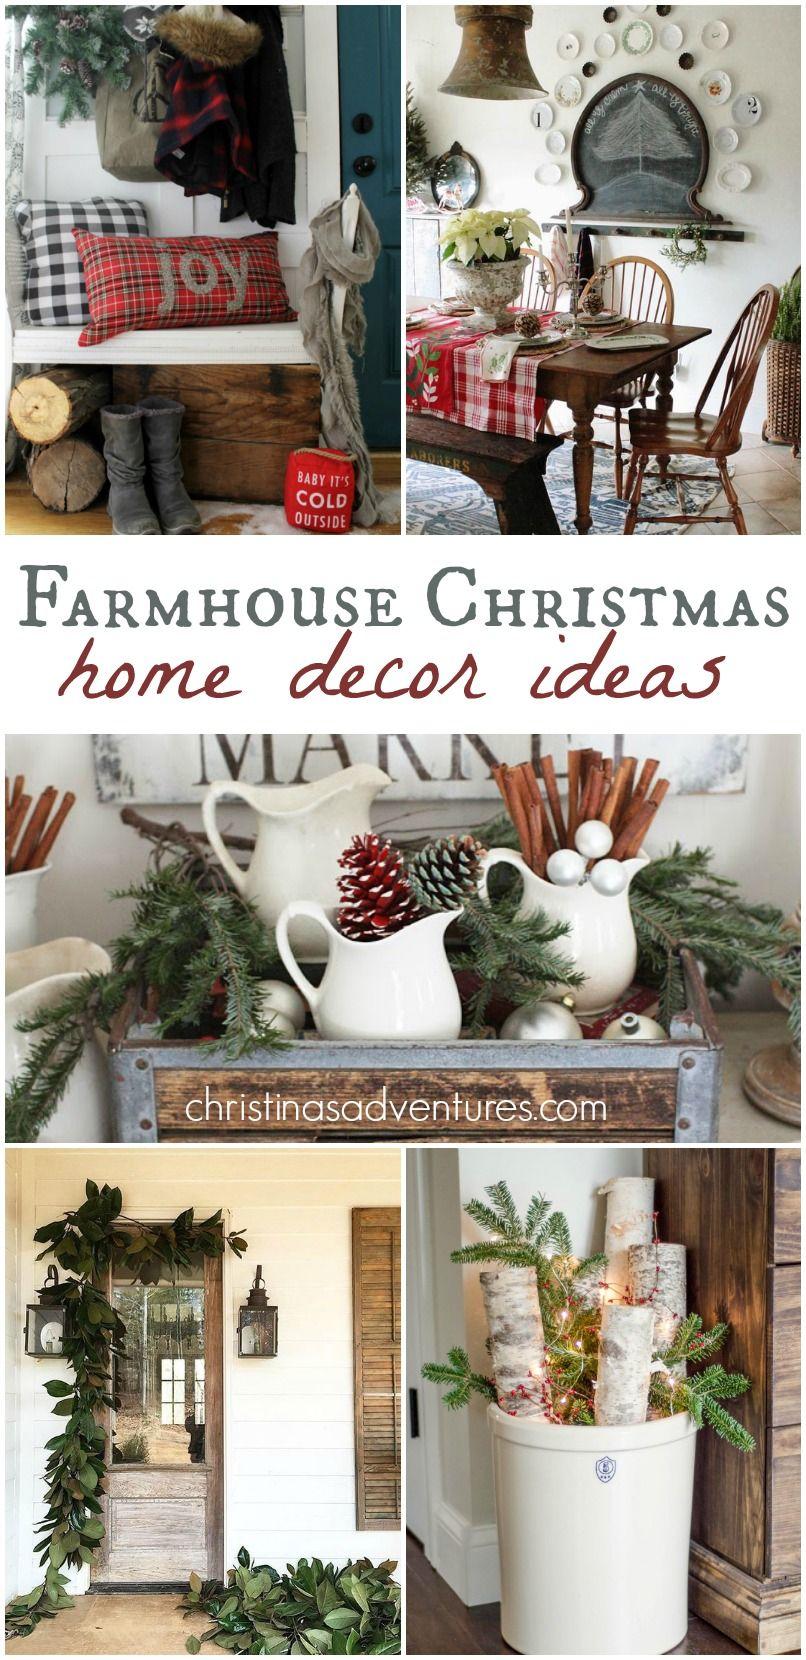 Farmhouse Christmas Decorating Ideas Holidays, Porch and